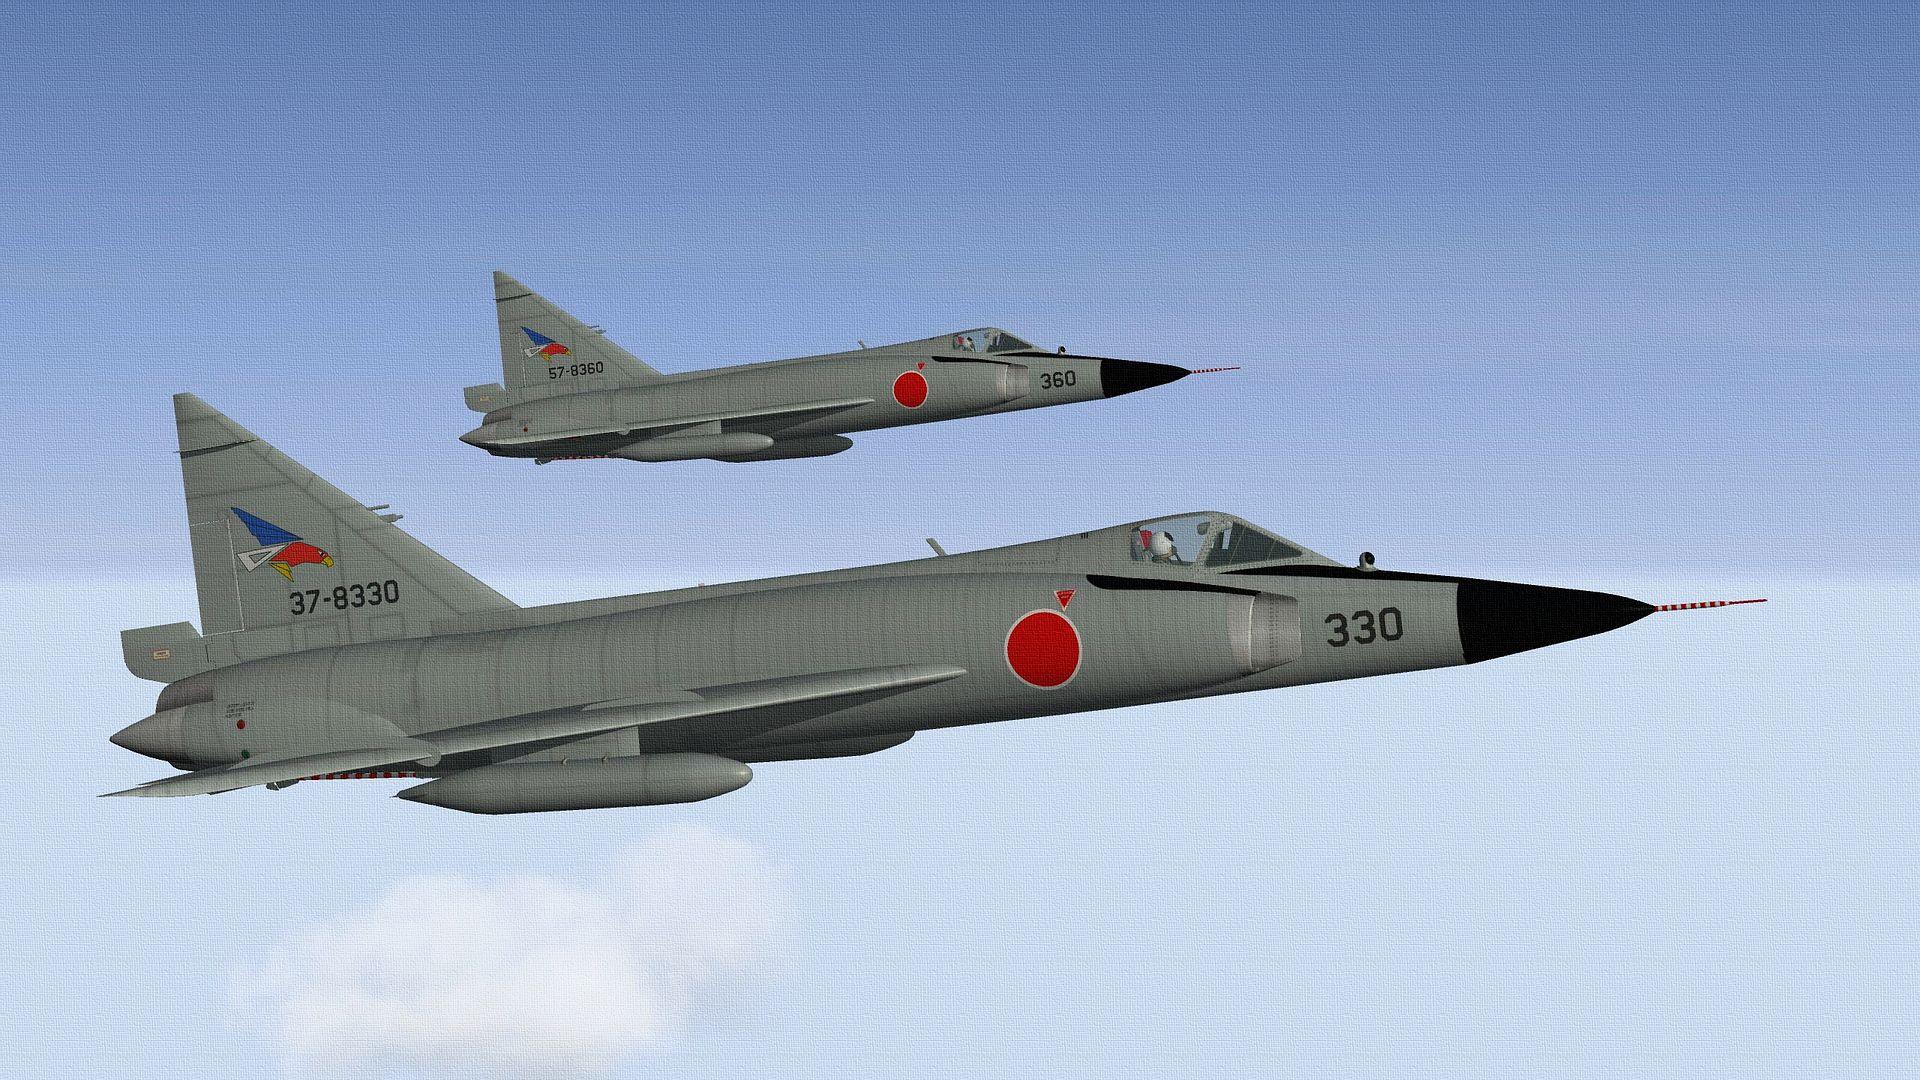 JASDF%20F-102A%20DELTA%20DAGGER.07_zps3b